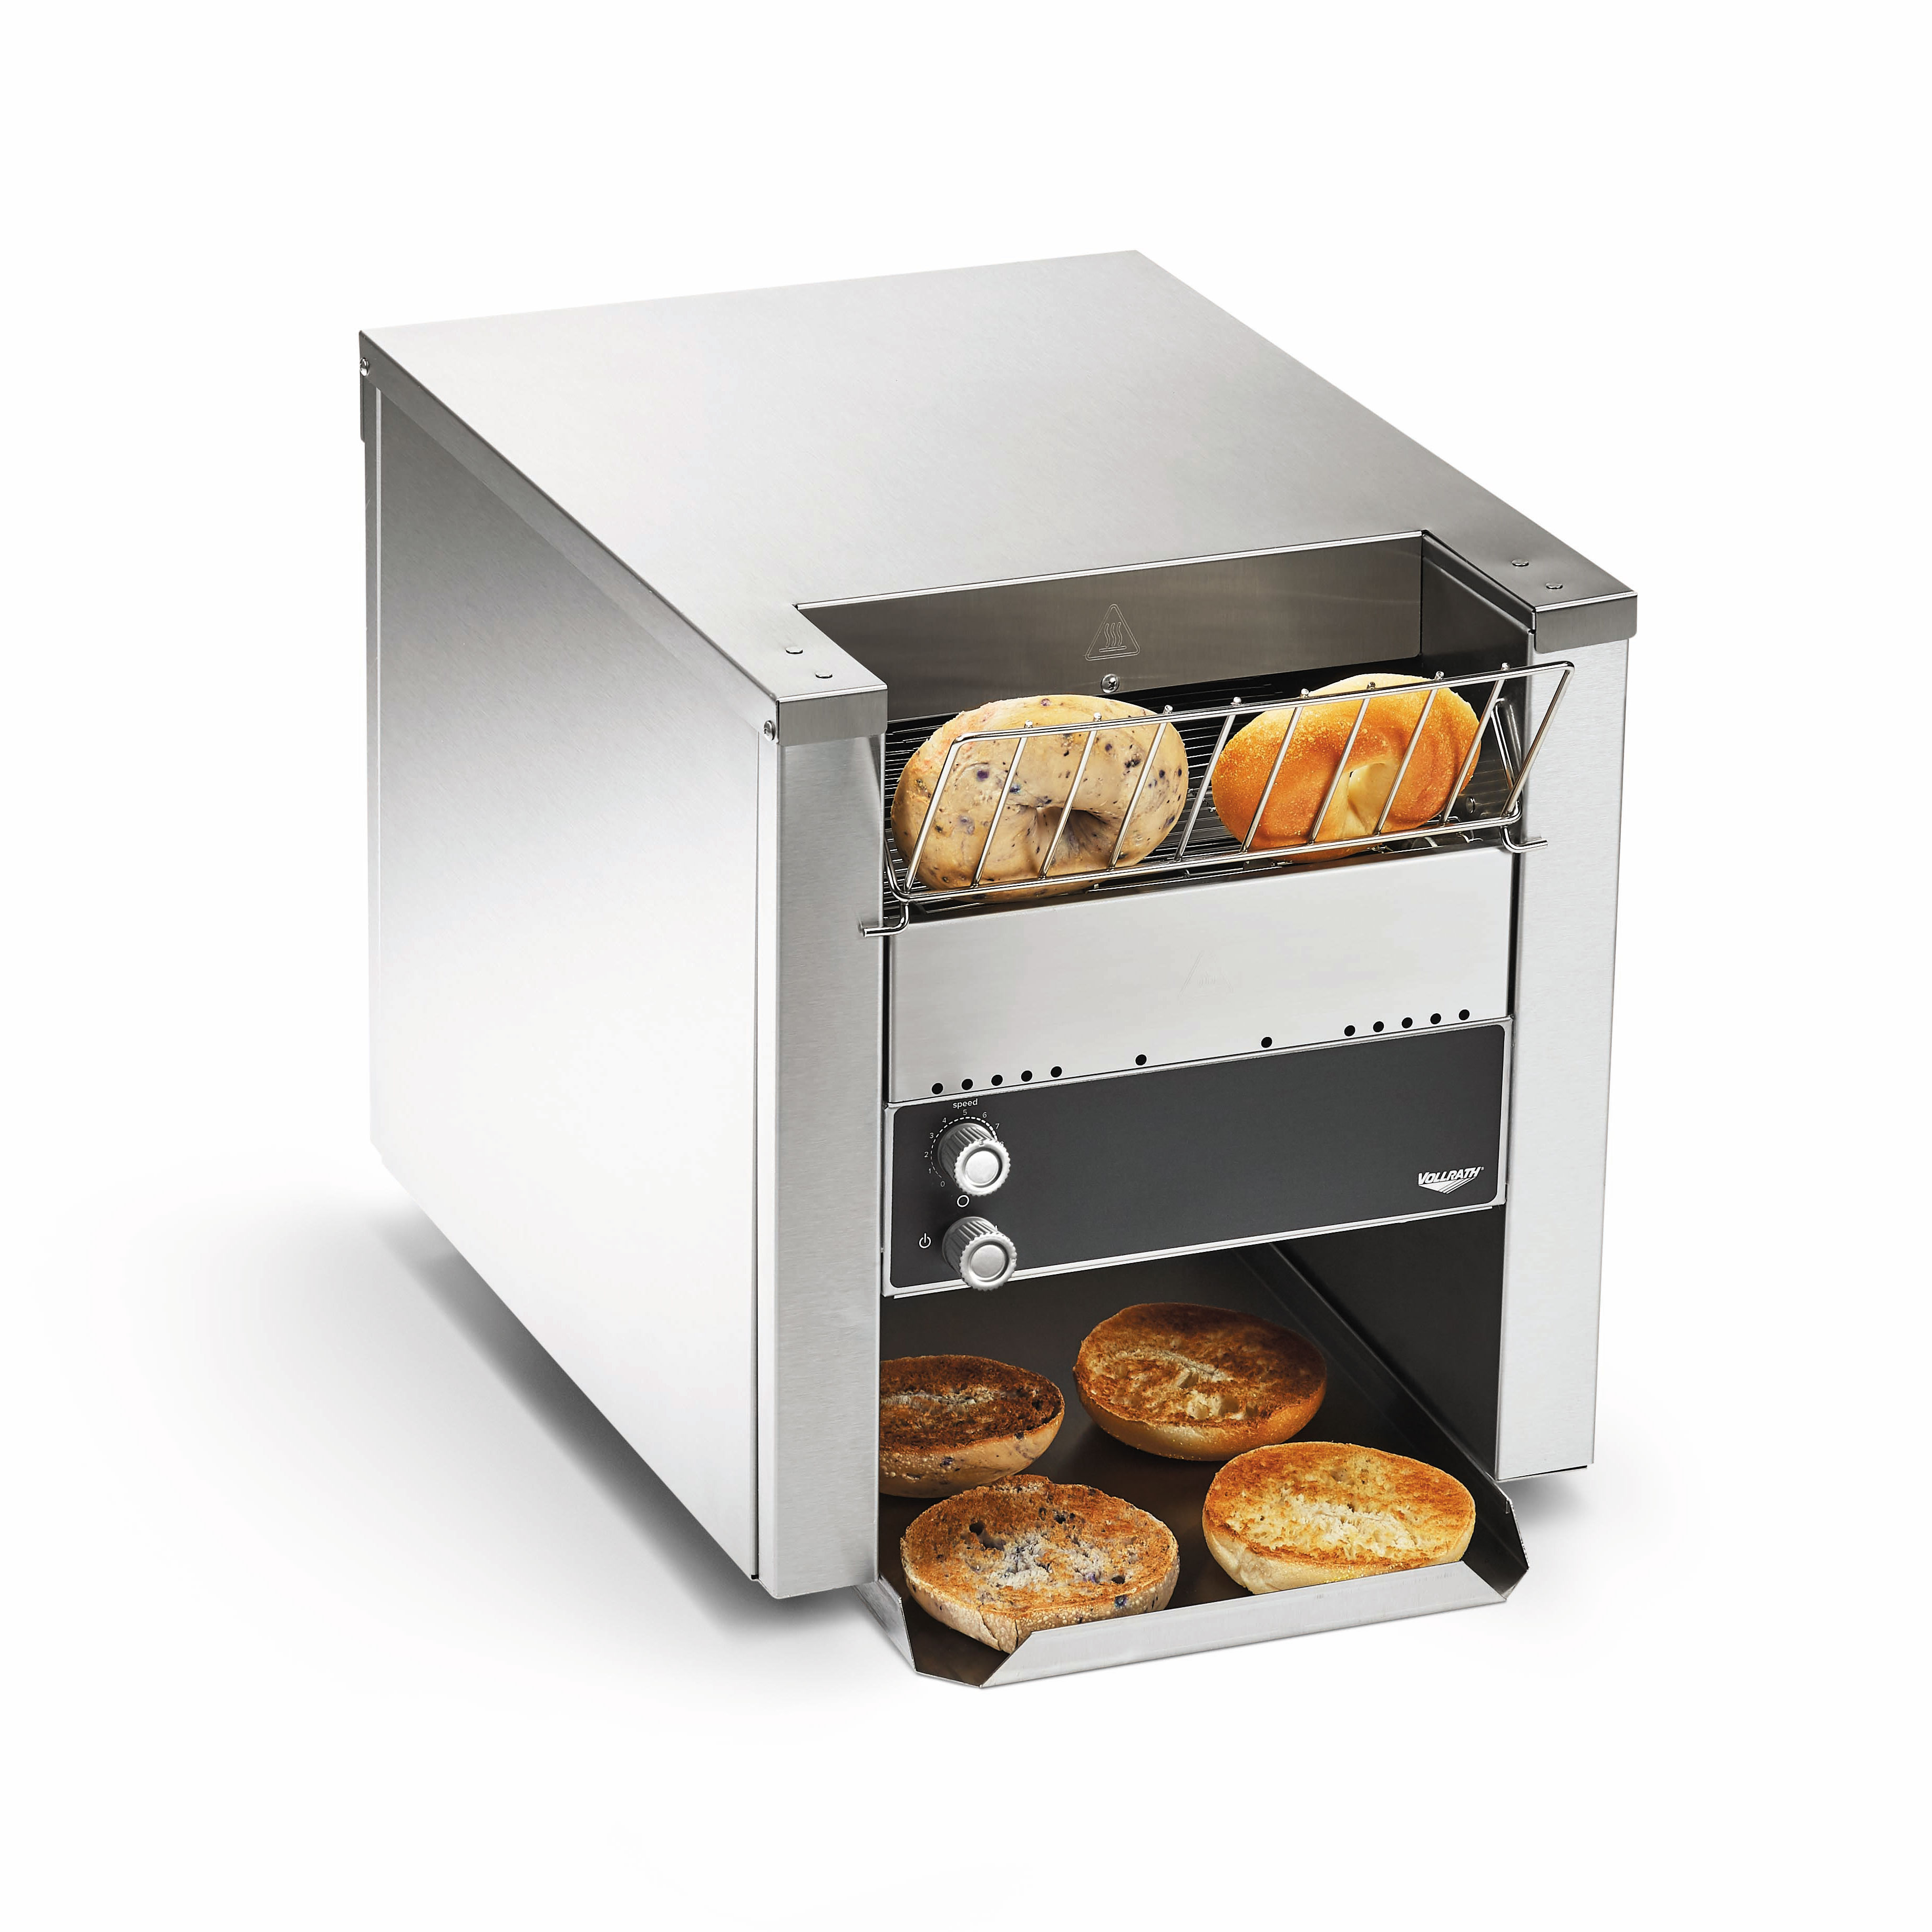 Vollrath CT4-2202000 toaster, conveyor type